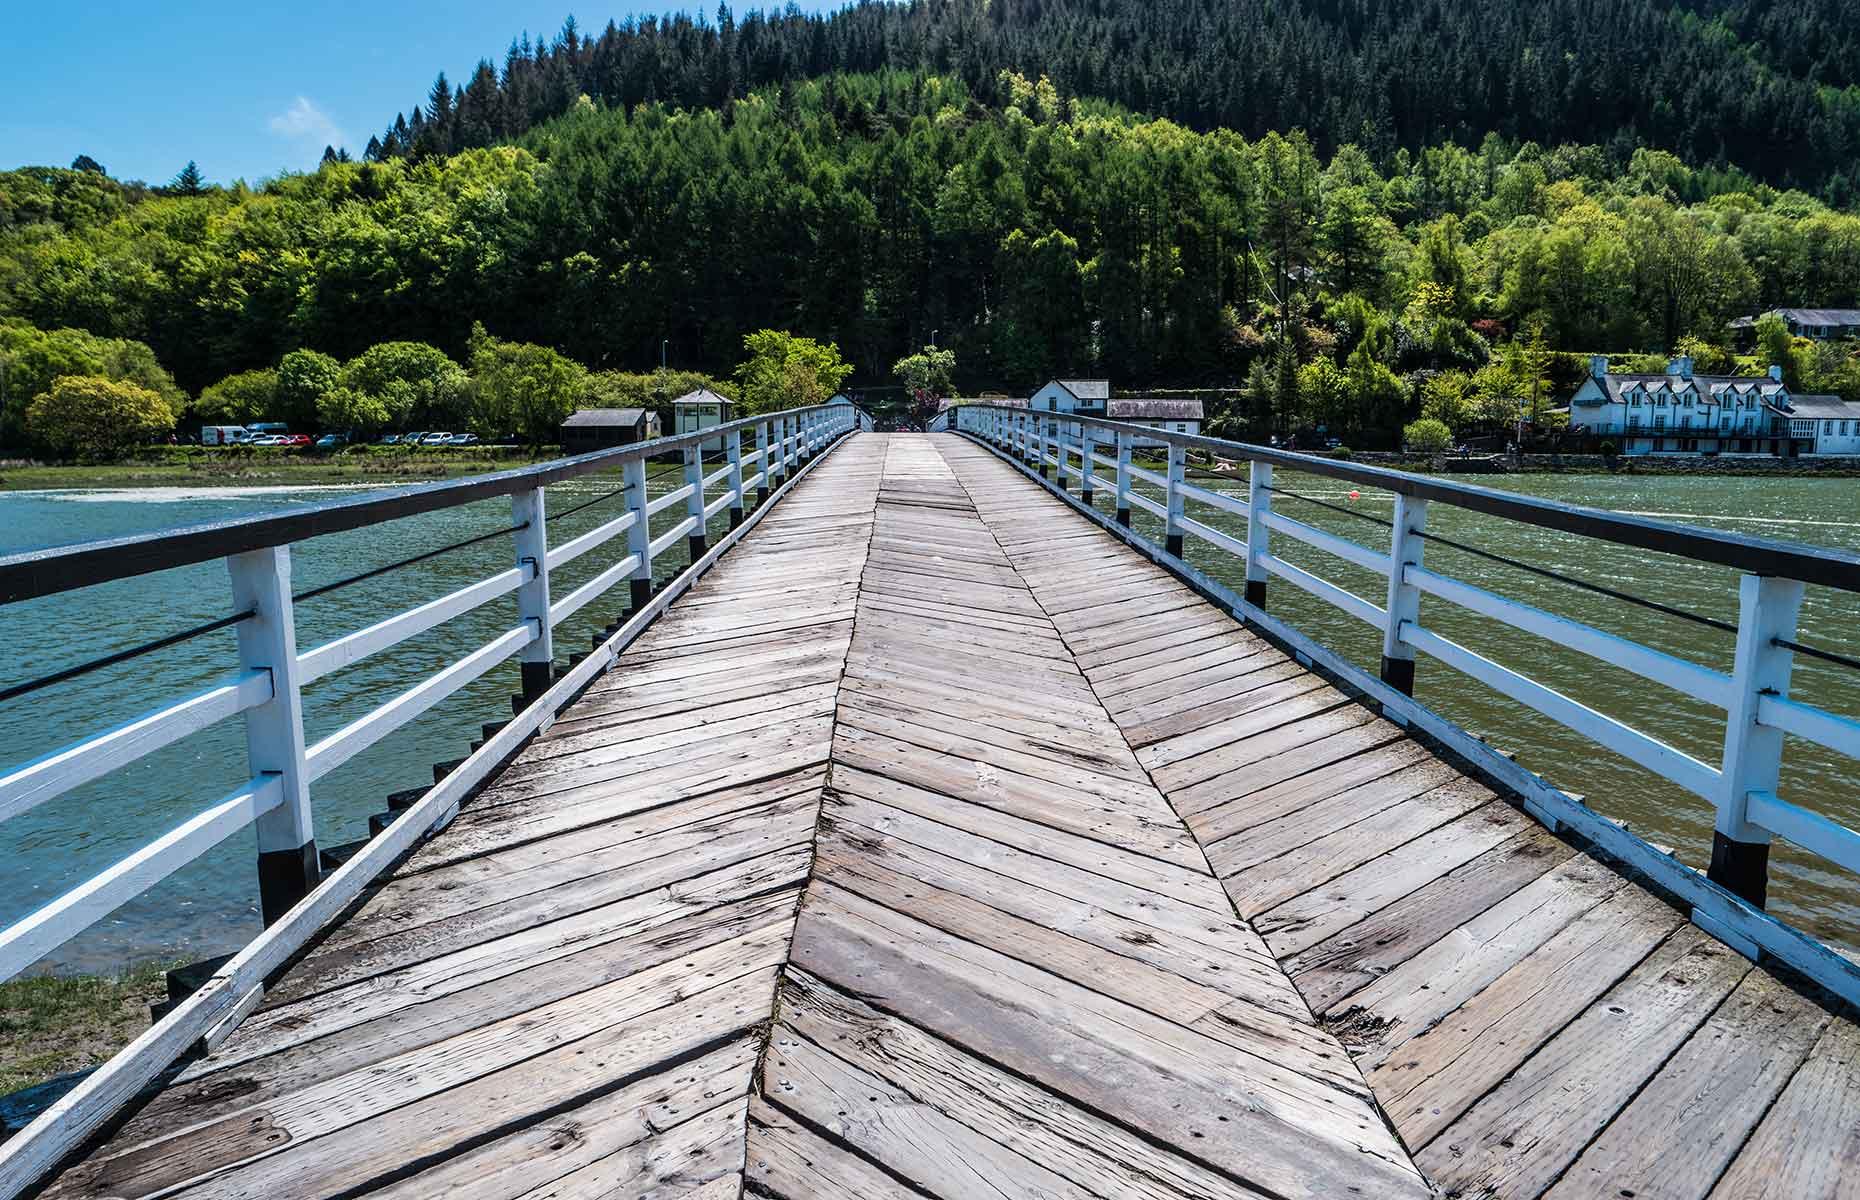 Penmaenpool Toll Bridge (Image: Henrykc/Shutterstock)